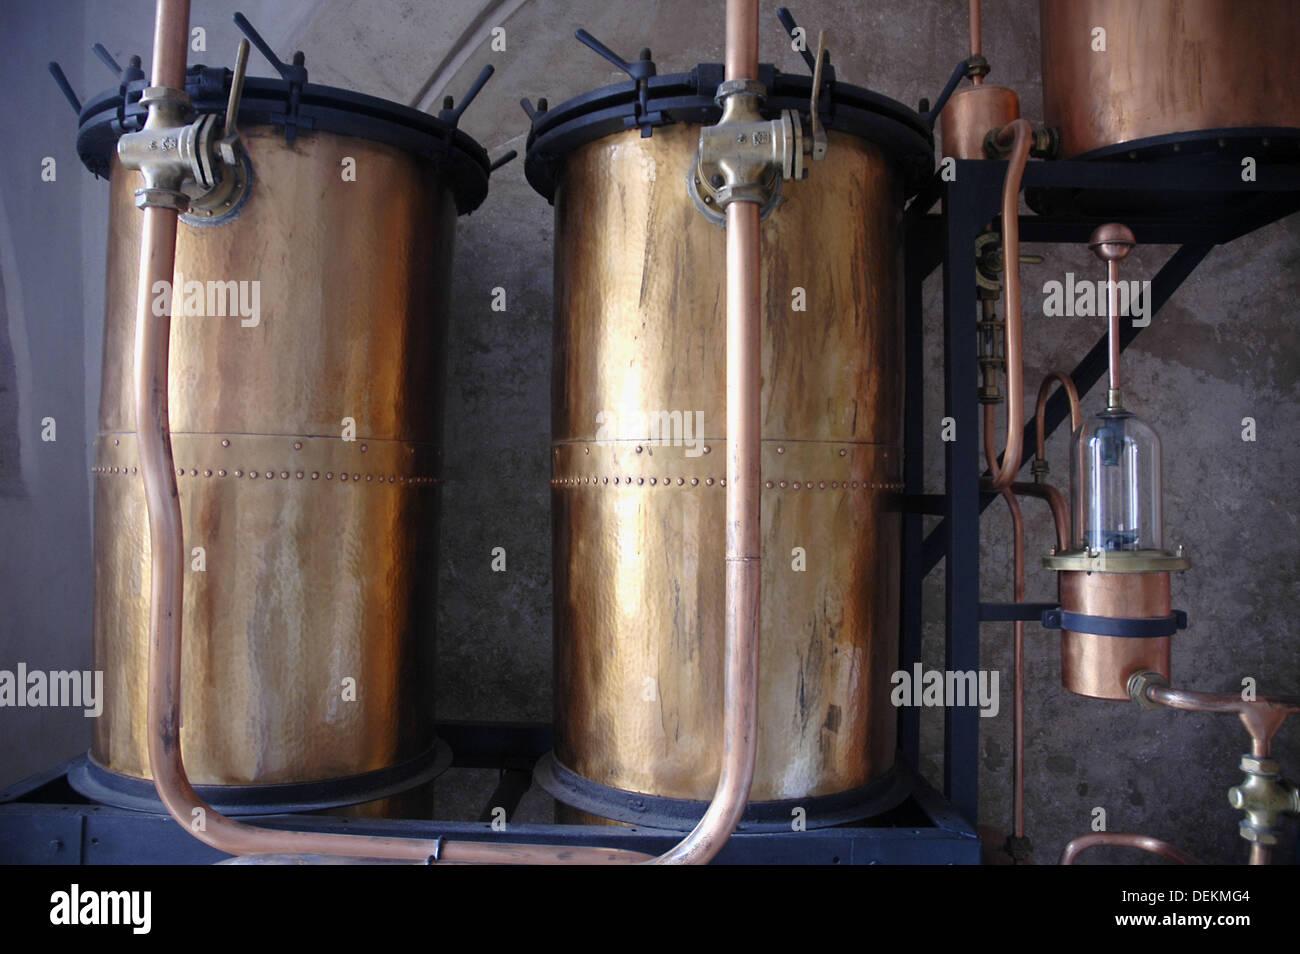 Bassano del Grappa Italy, stills for making grappa - Stock Image